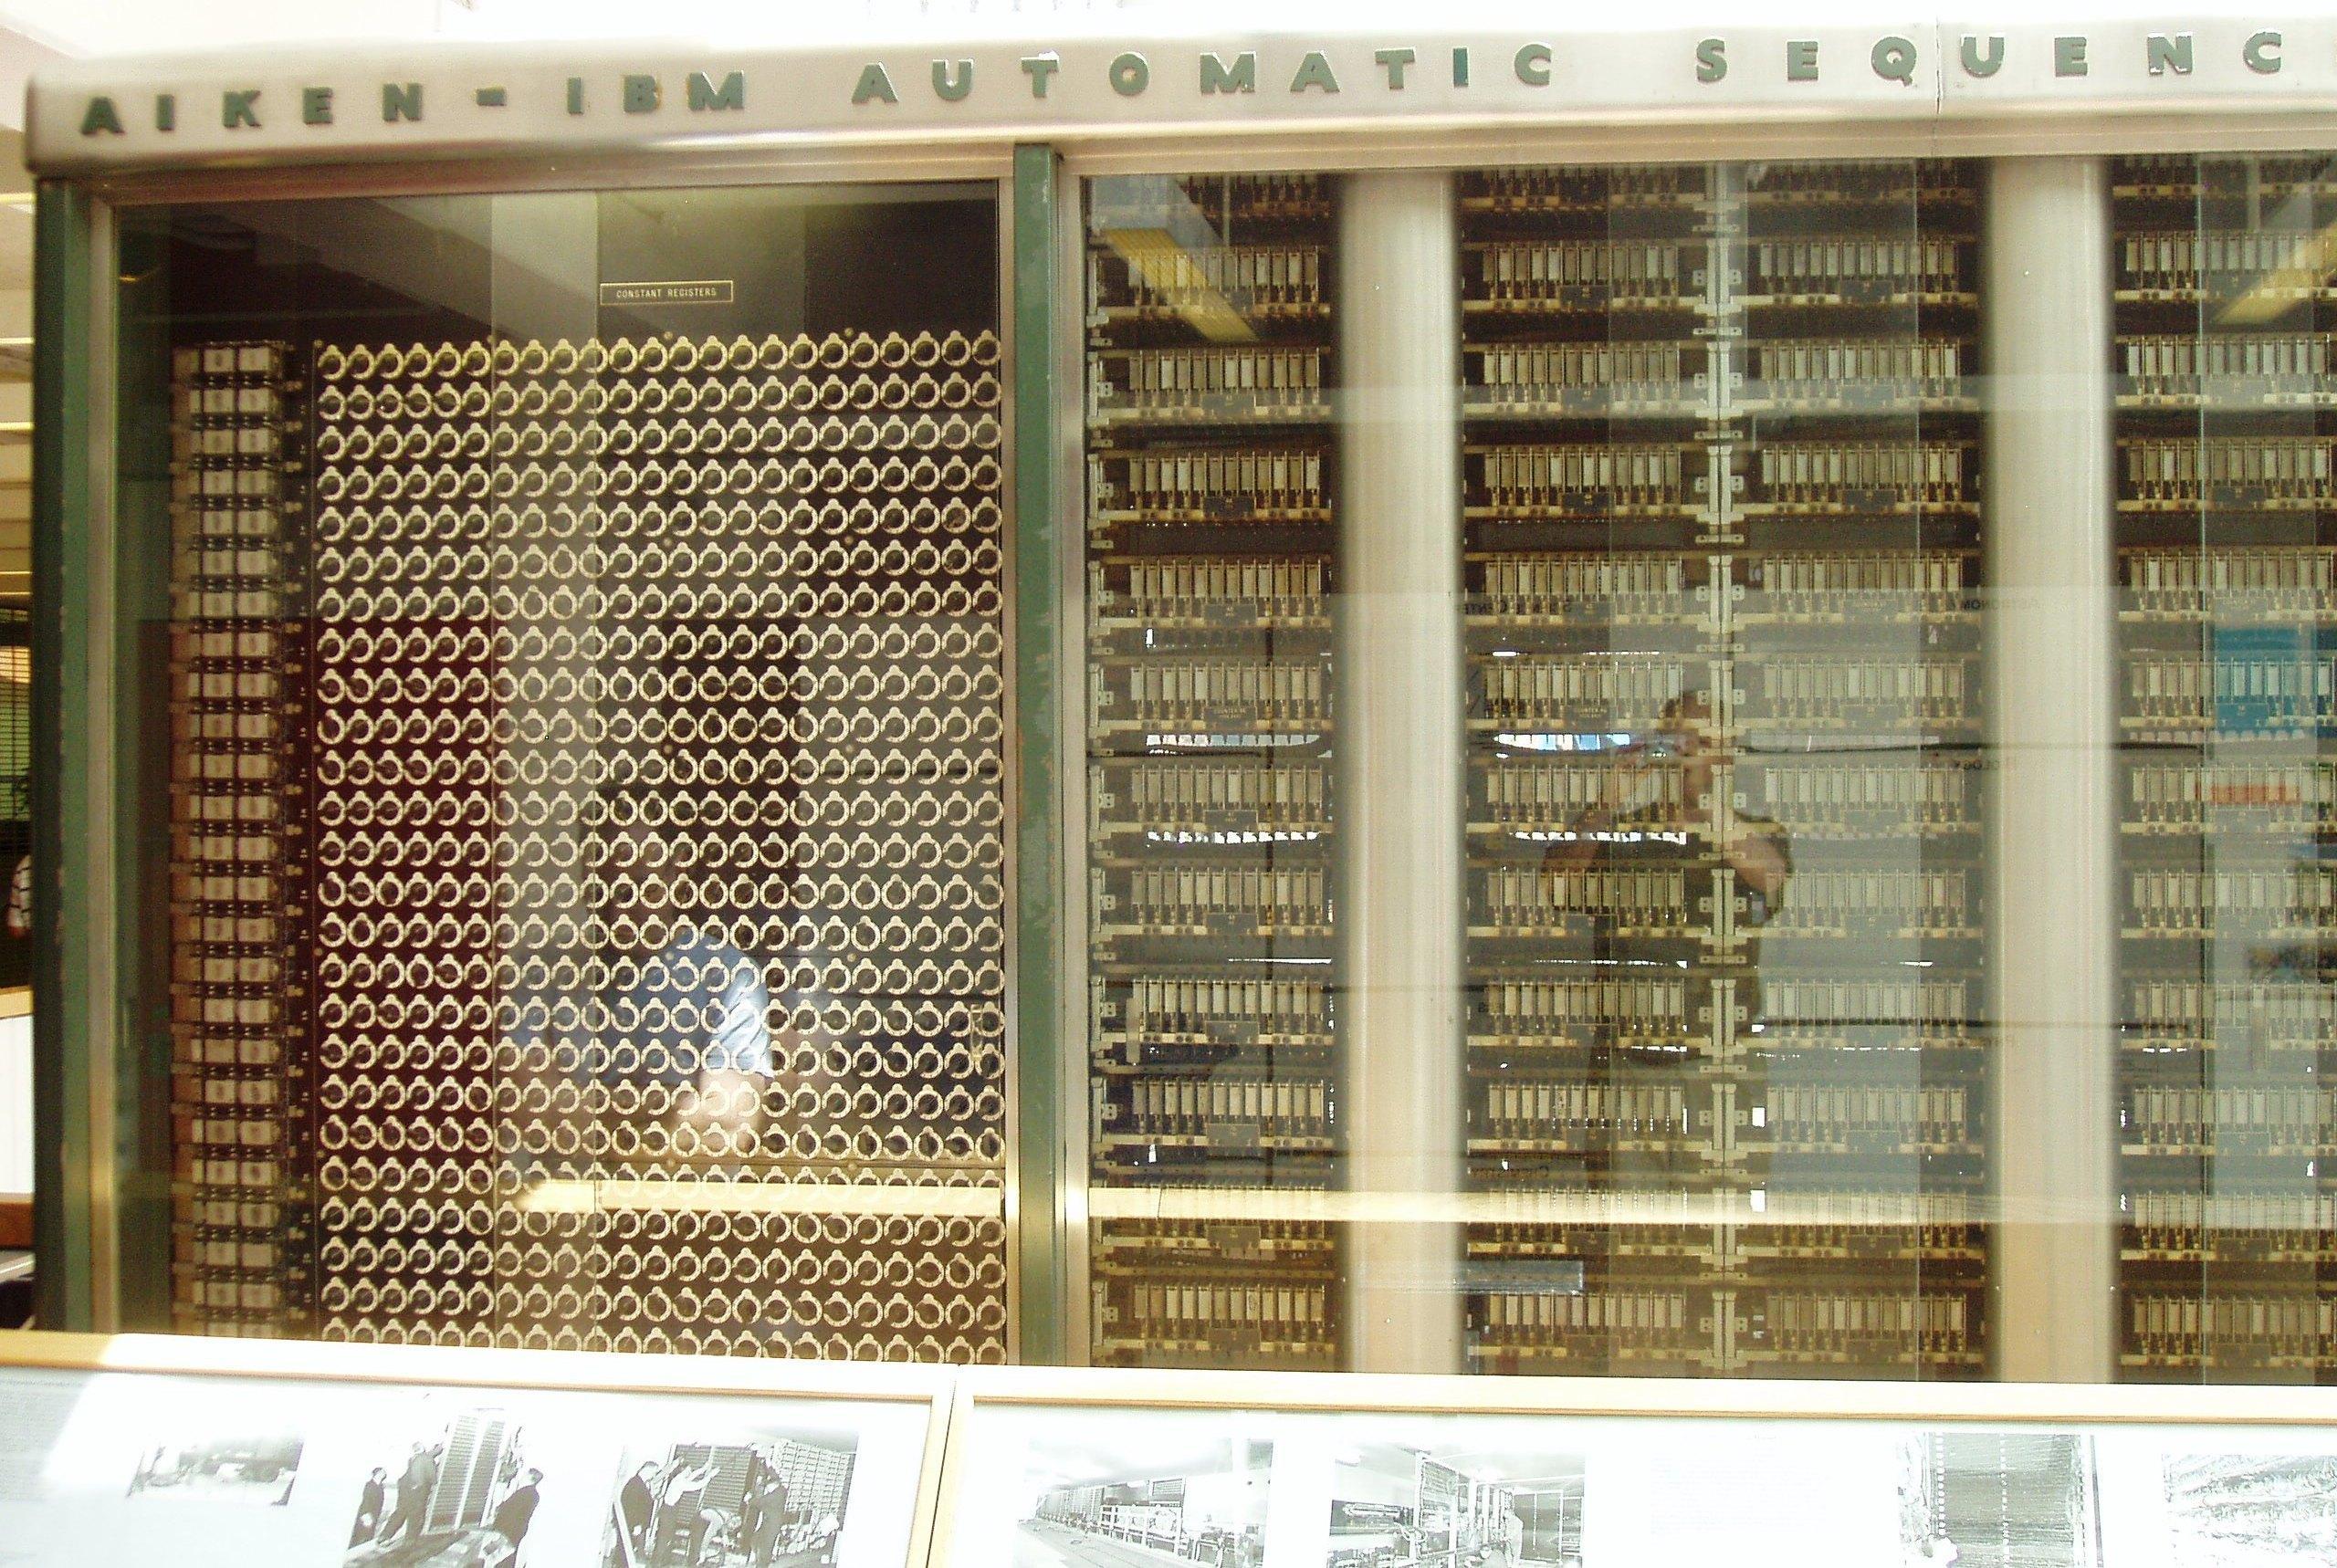 Mark i первый компьютер говарда айкена